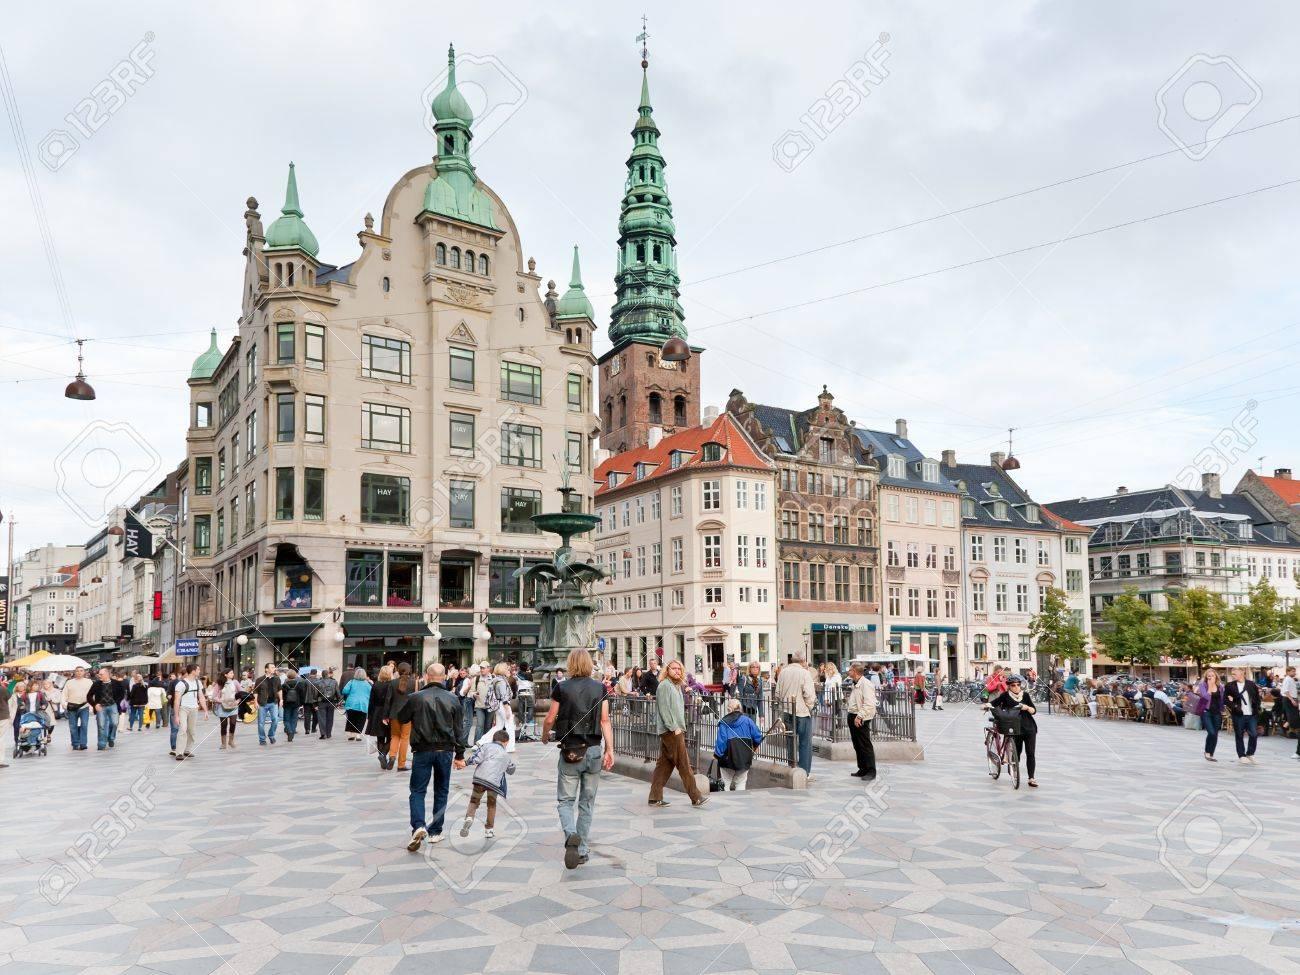 COPENHAGEN - SEPTEMBER, 10: Amagertorv - central square. In 1449 it is  referred